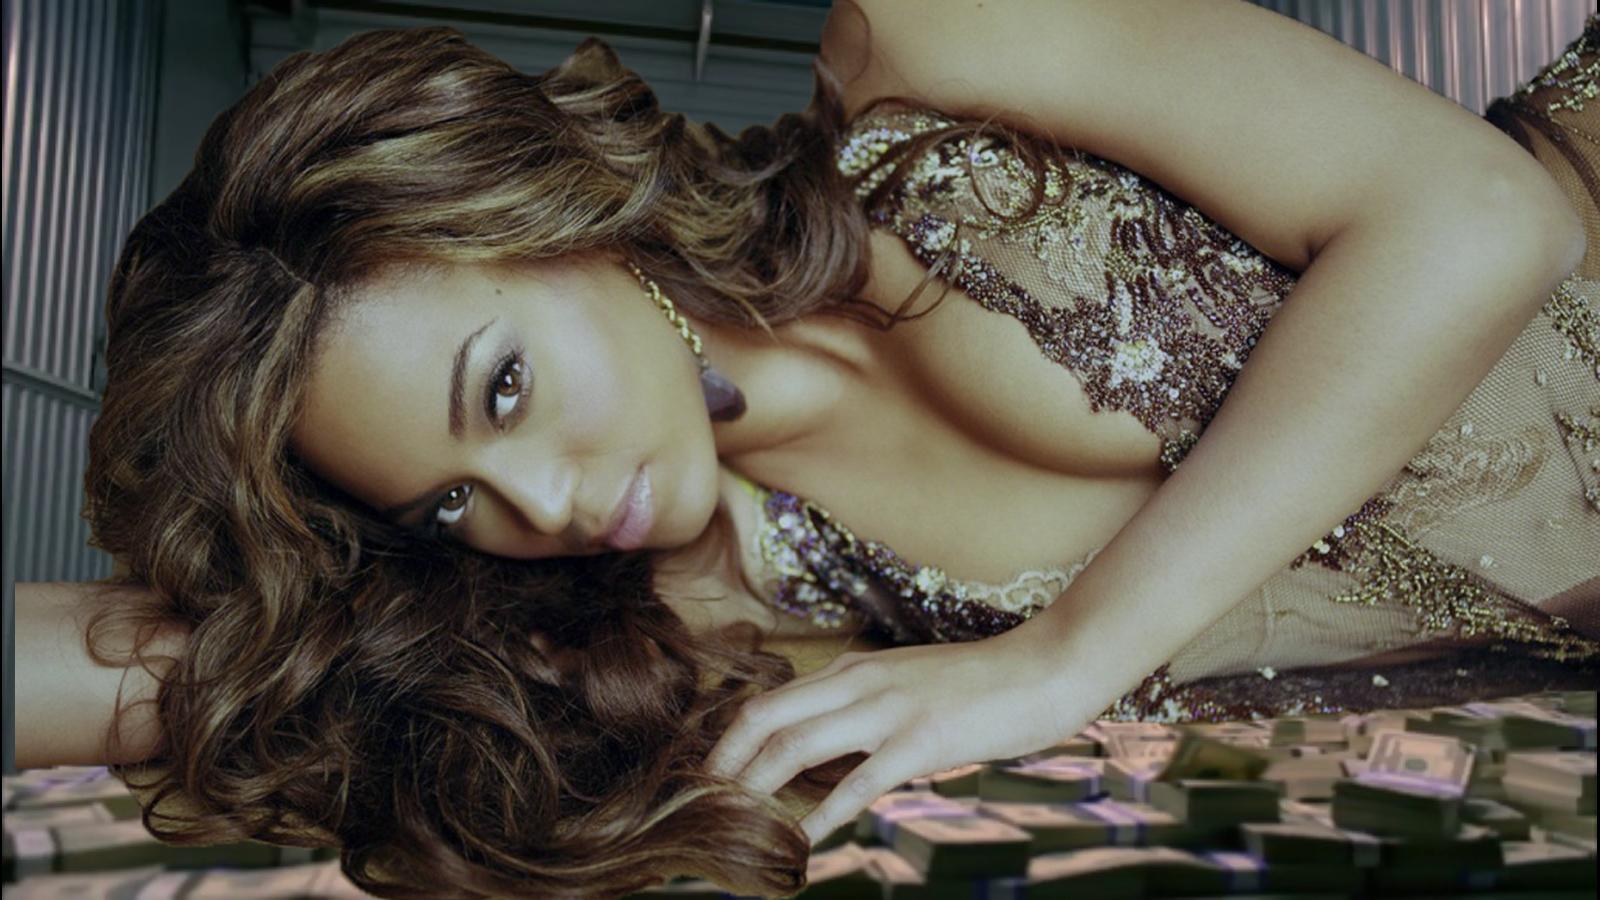 Beyonce Money Breaking bad Forbes Celebrity 100 top list lebron james dr. dre